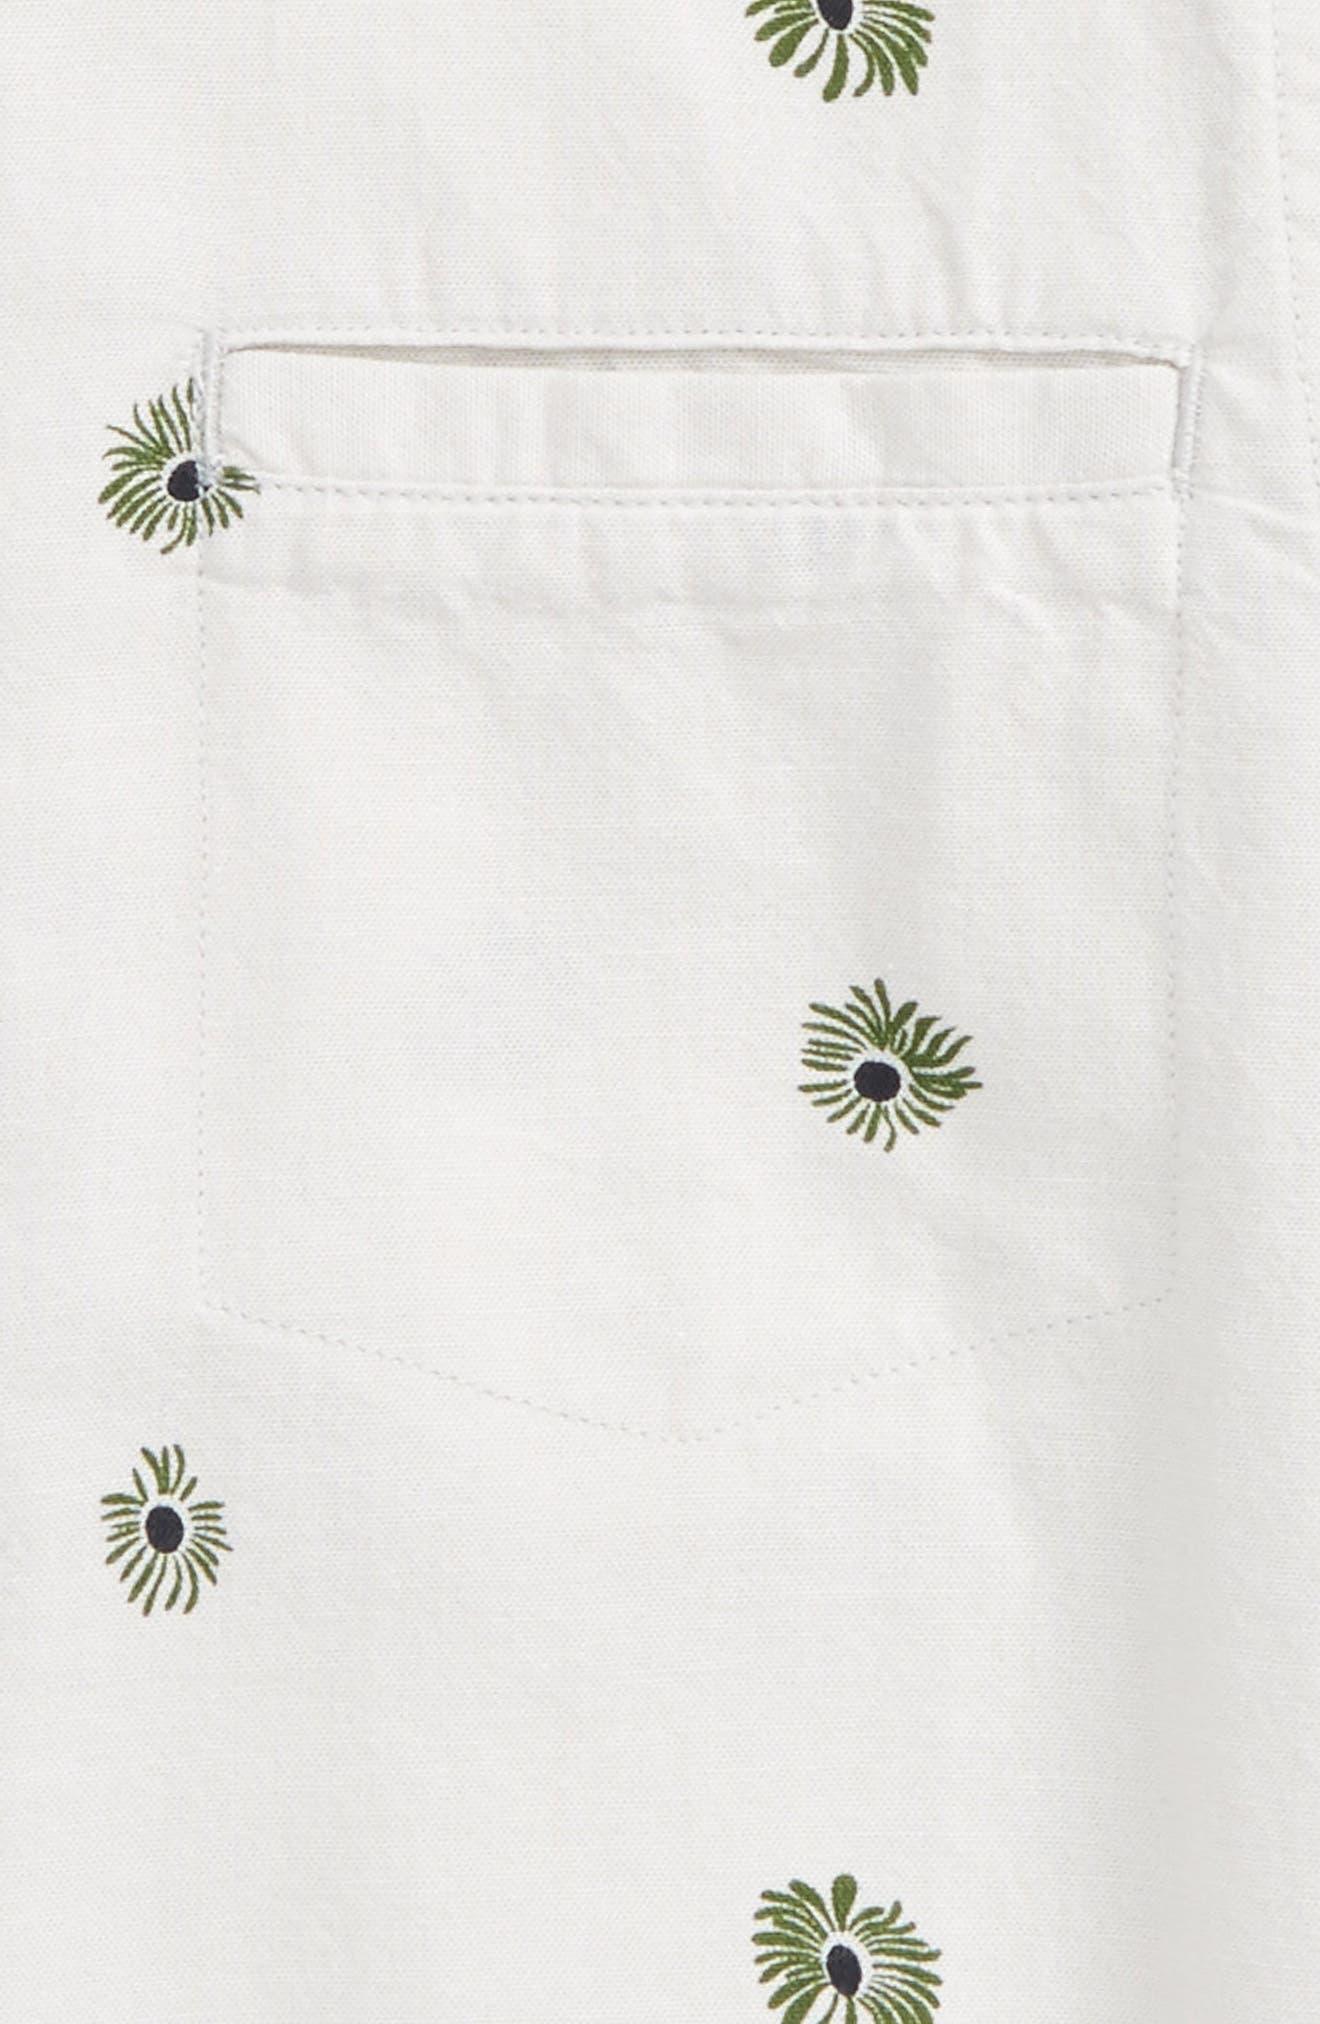 Brees Floral Print Woven Shirt,                             Alternate thumbnail 2, color,                             036